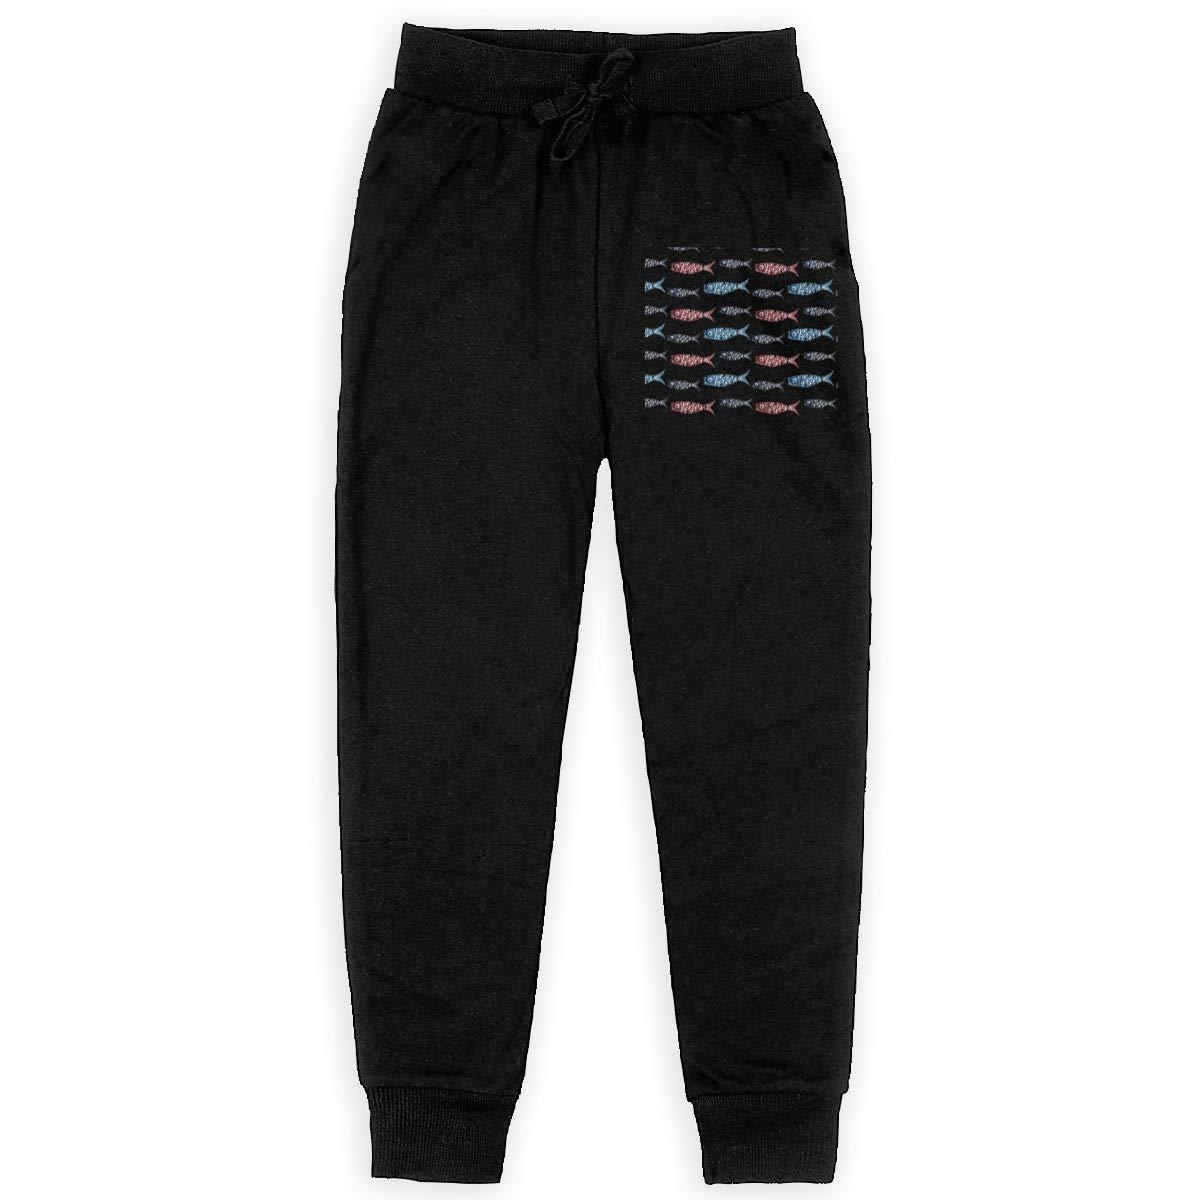 Kim Mittelstaedt Carp Flag Boys Big Active Basic Casual Pants Sweatpants for Boys Black